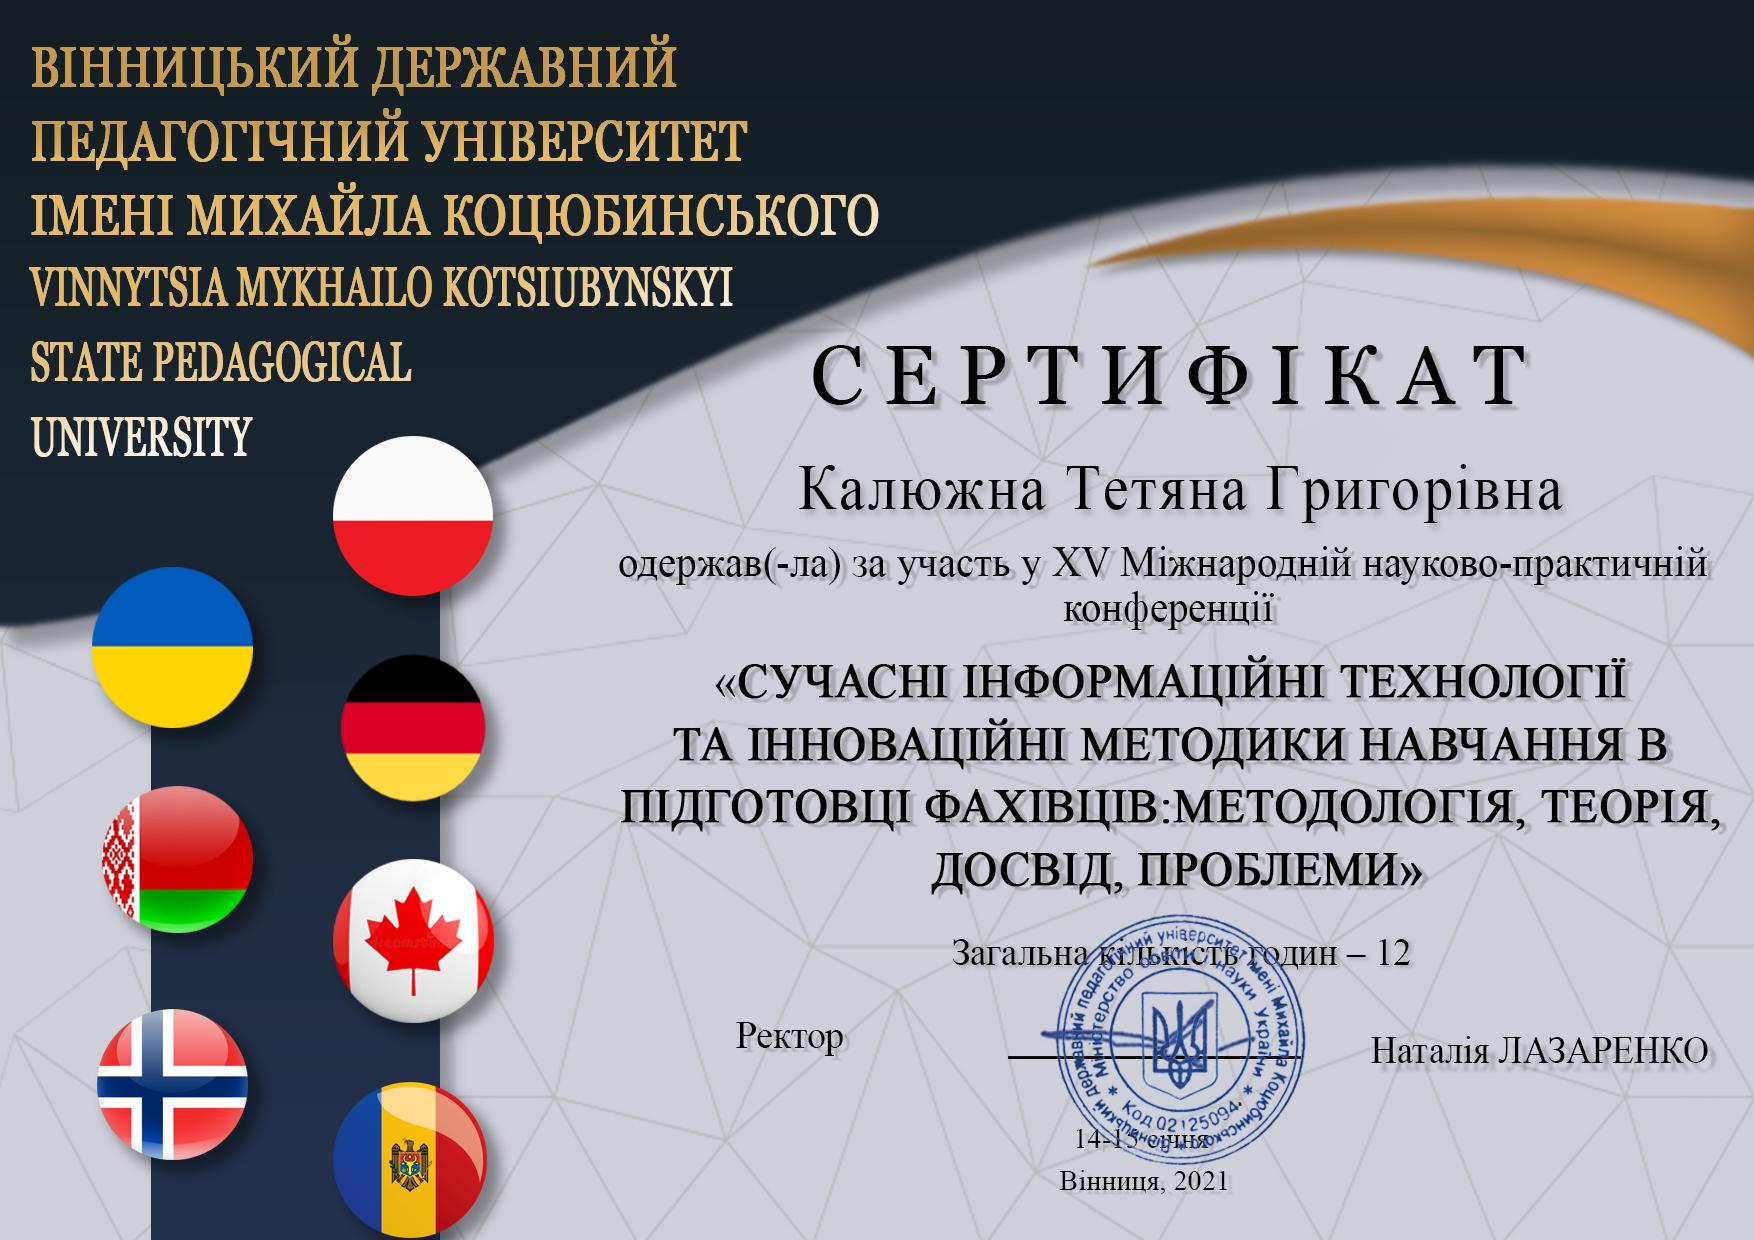 Калюжна Тетяна Григорівна